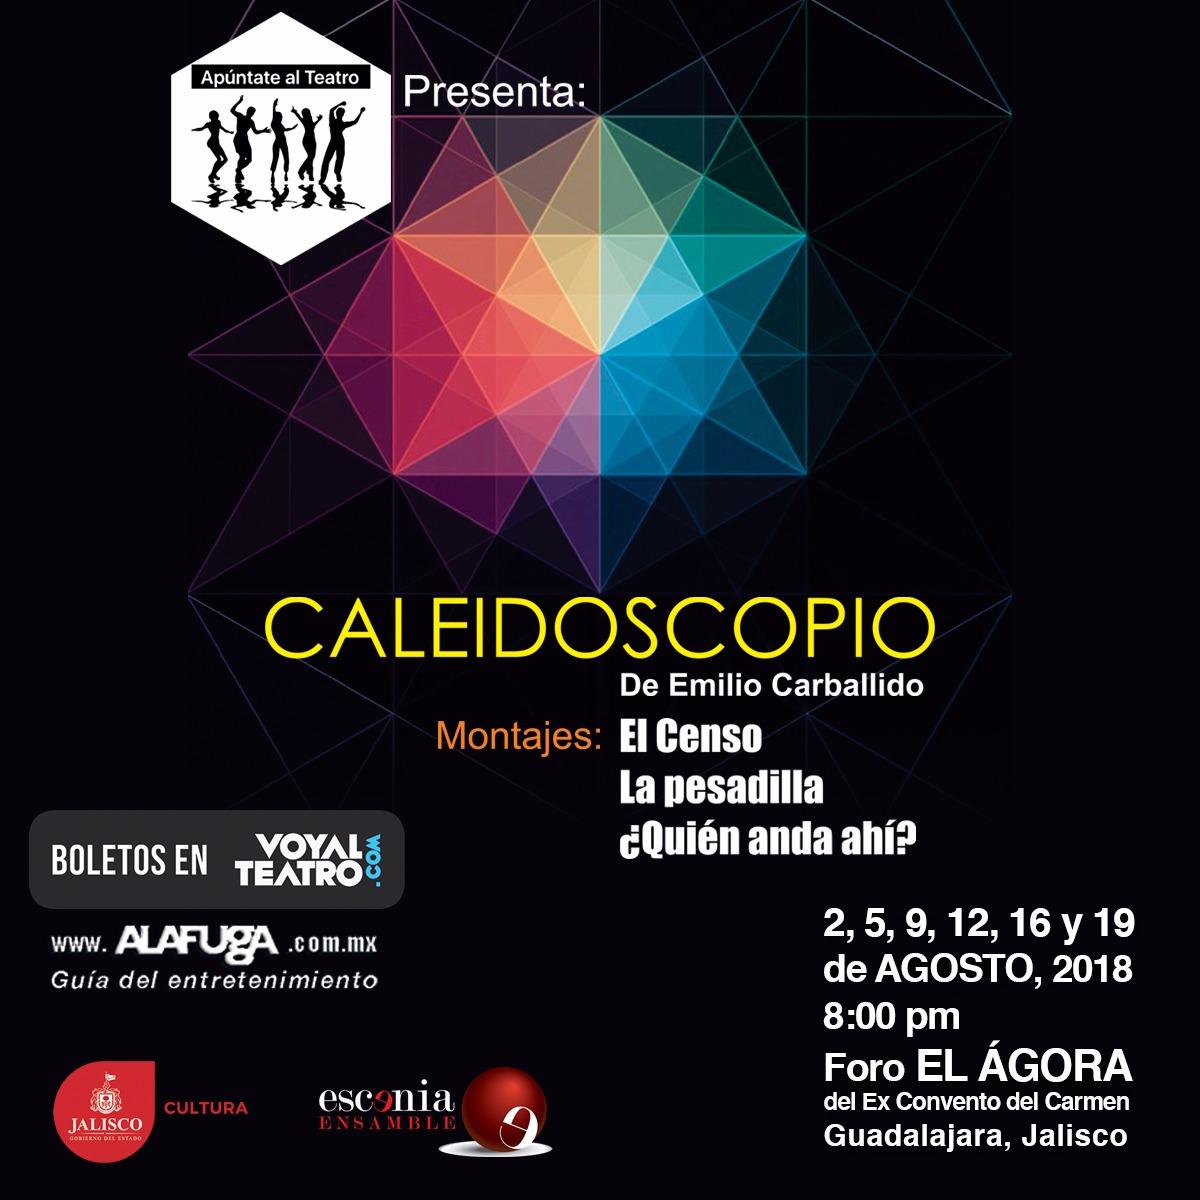 Caleidoscopio de Emilio Carballido / Foro Ágora del Exconvento del Carmen